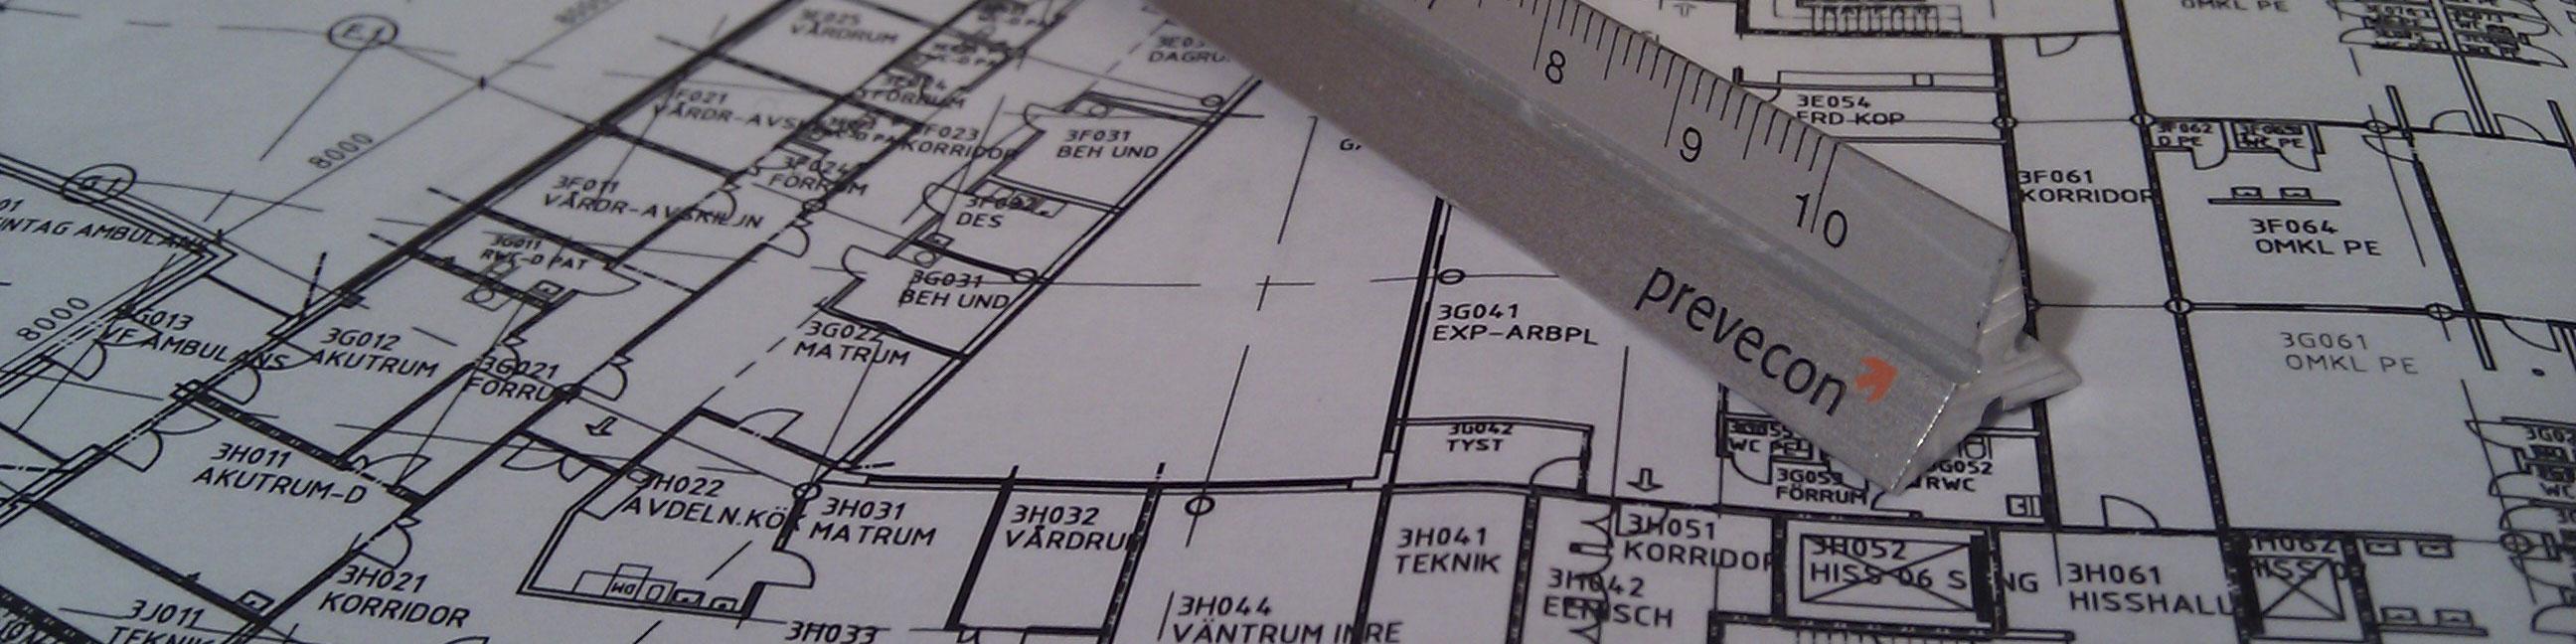 Brandteknisk projektering | Prevecon